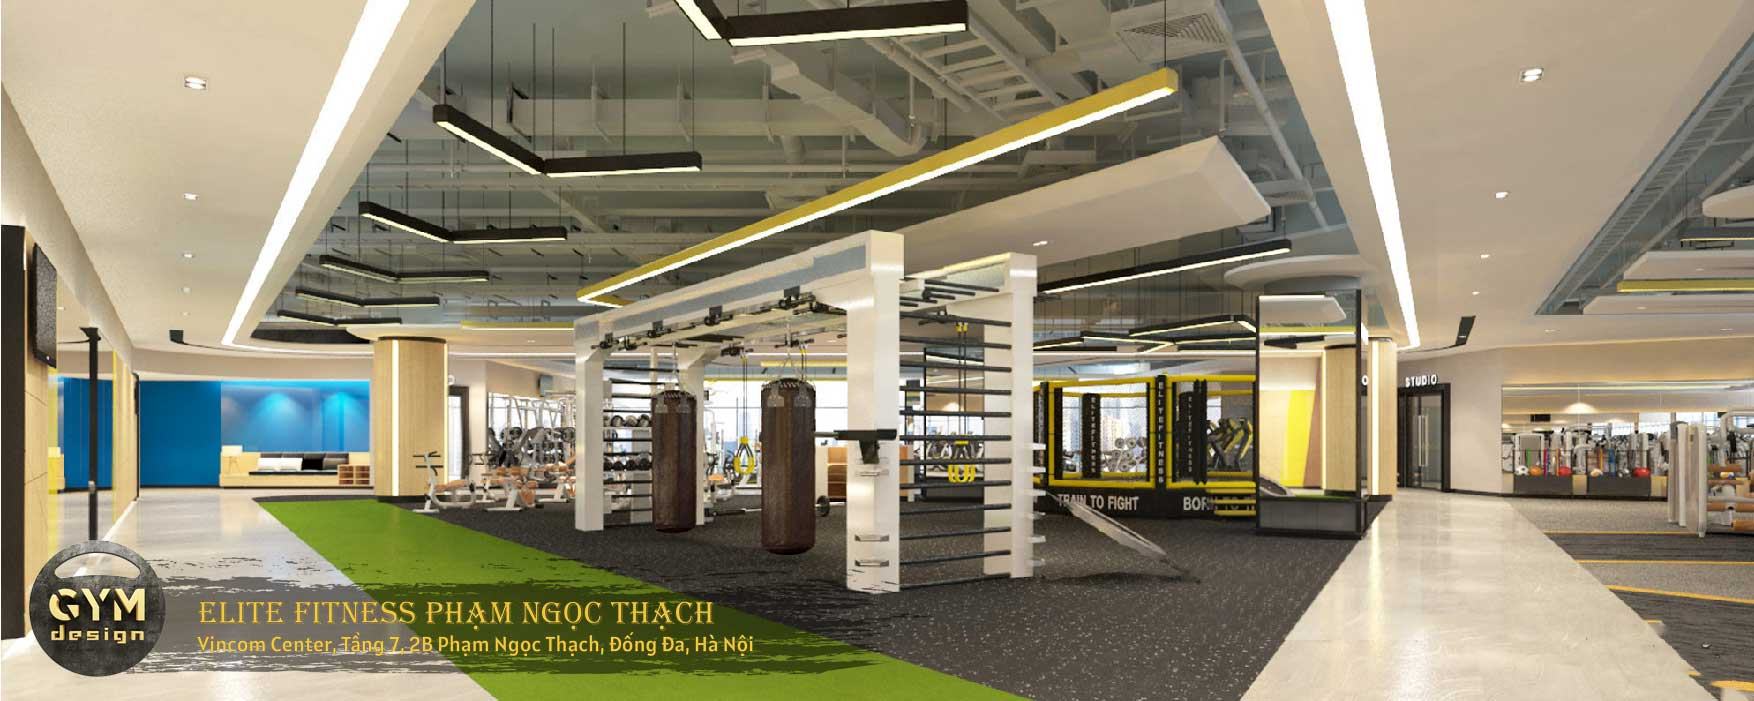 du-an-elite-fitness-pham-ngoc-thach-56